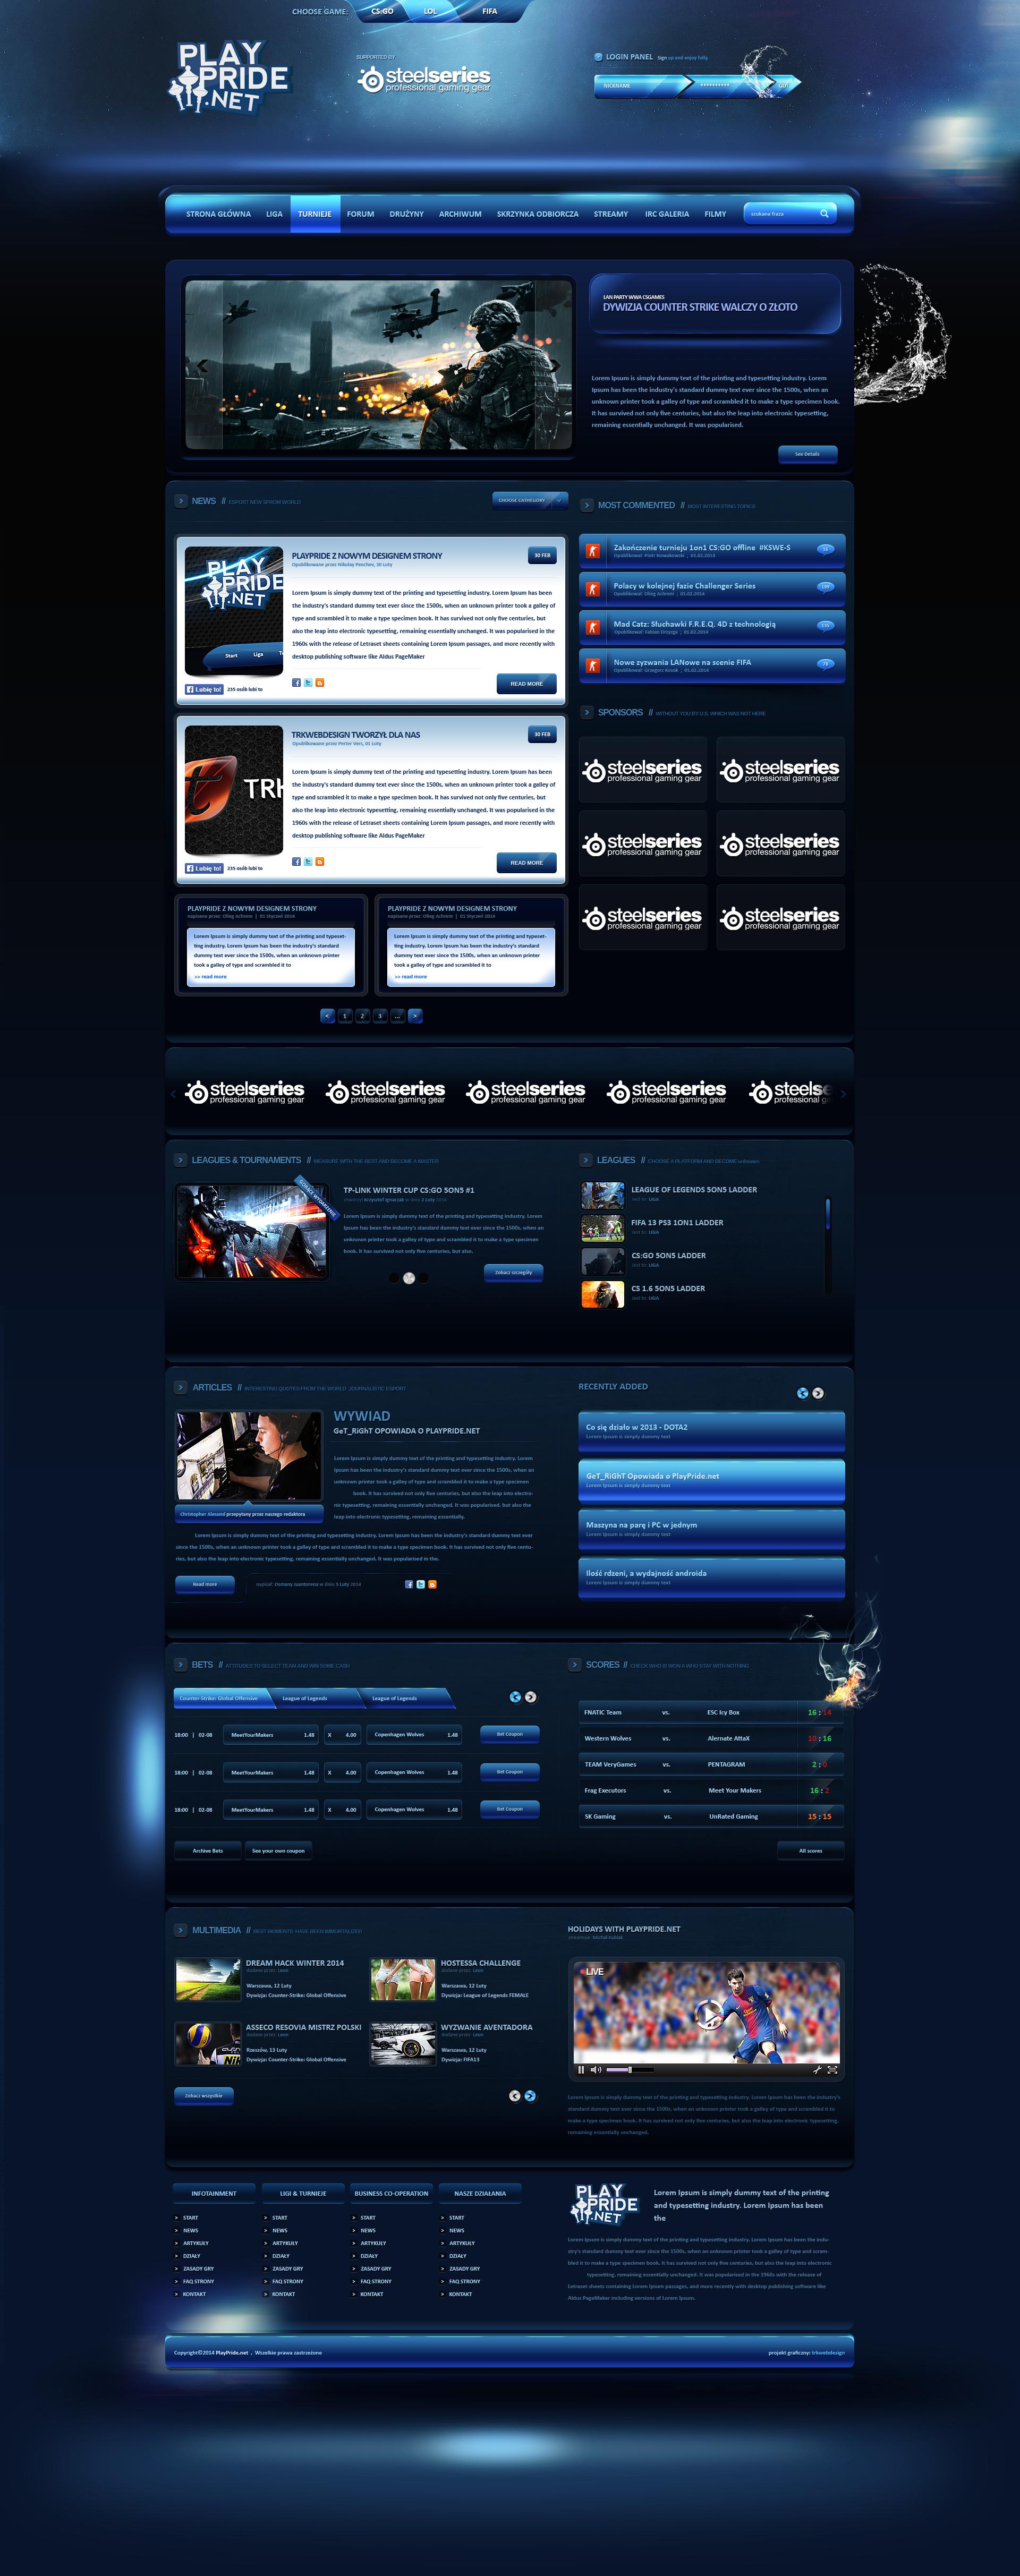 PLAYPRIDE - eSport League and Portal News by trkwebdesign